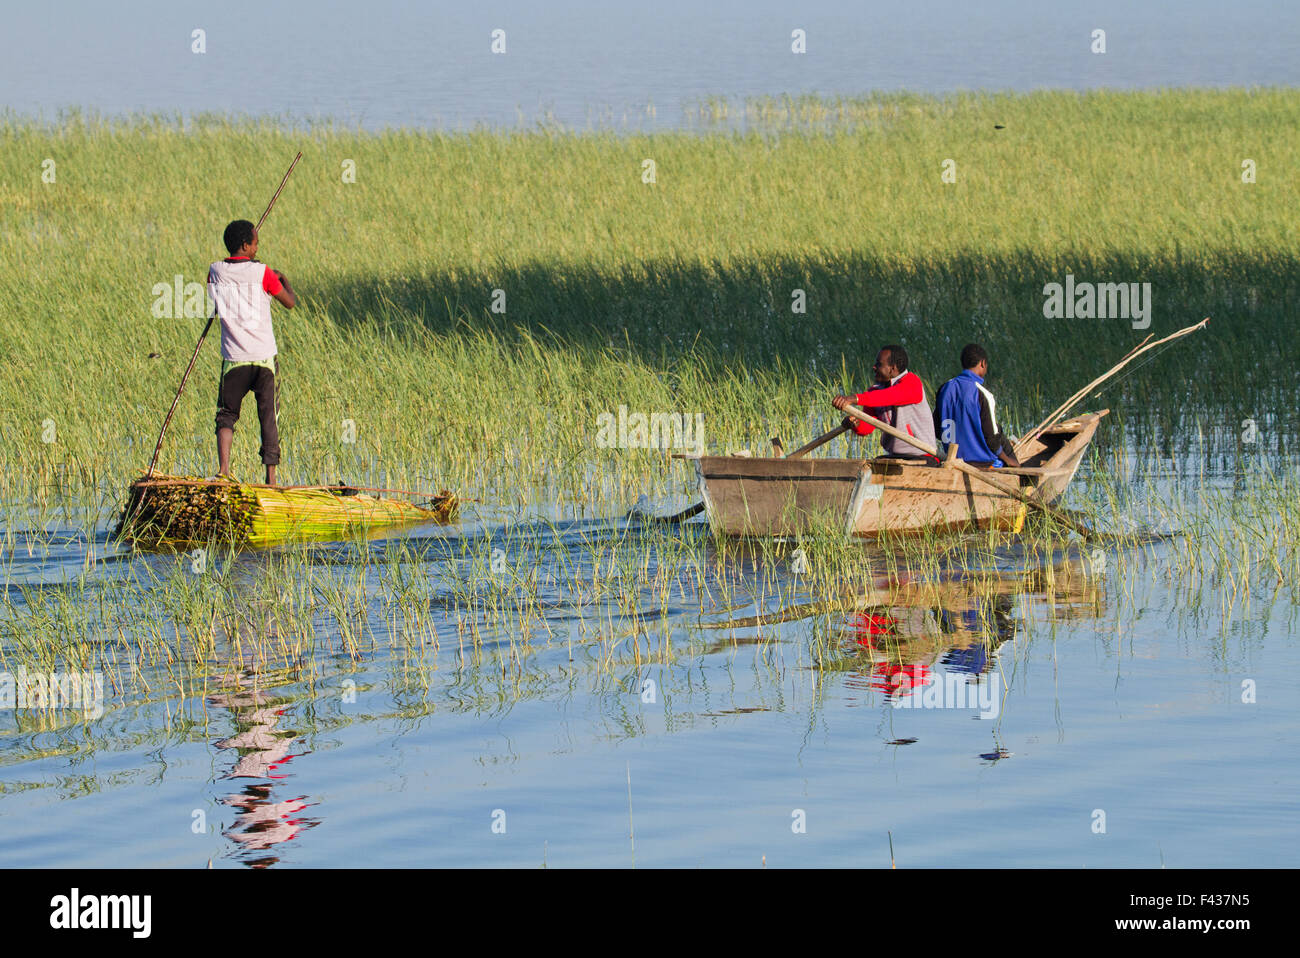 Africa, Ethiopia, Children fish in the river - Stock Image